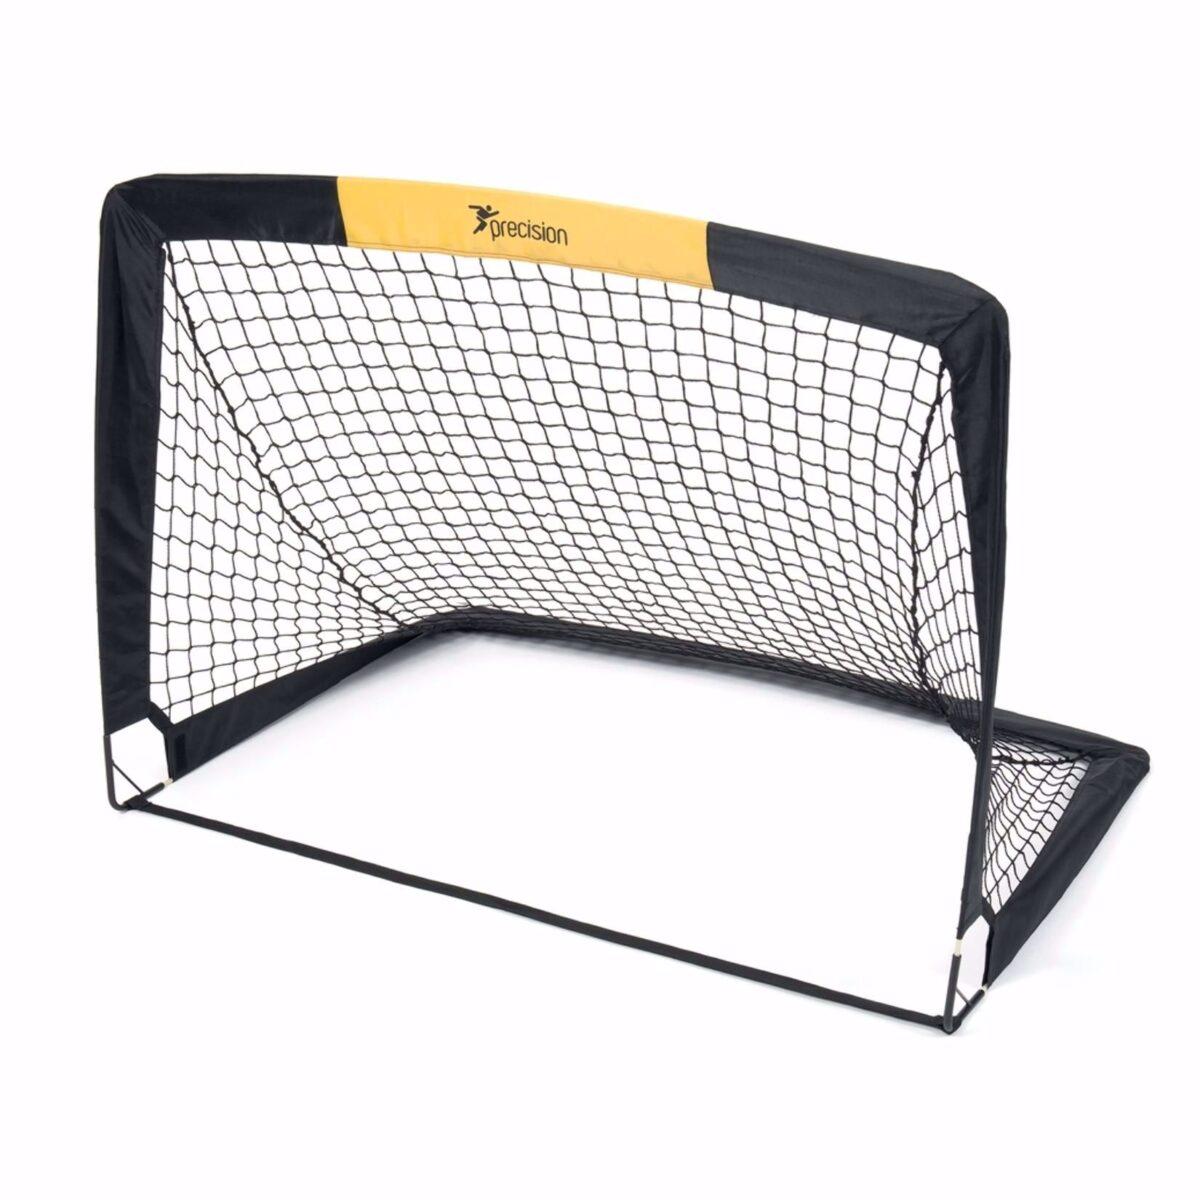 Precision Fold-A-Goal 4'x 3'